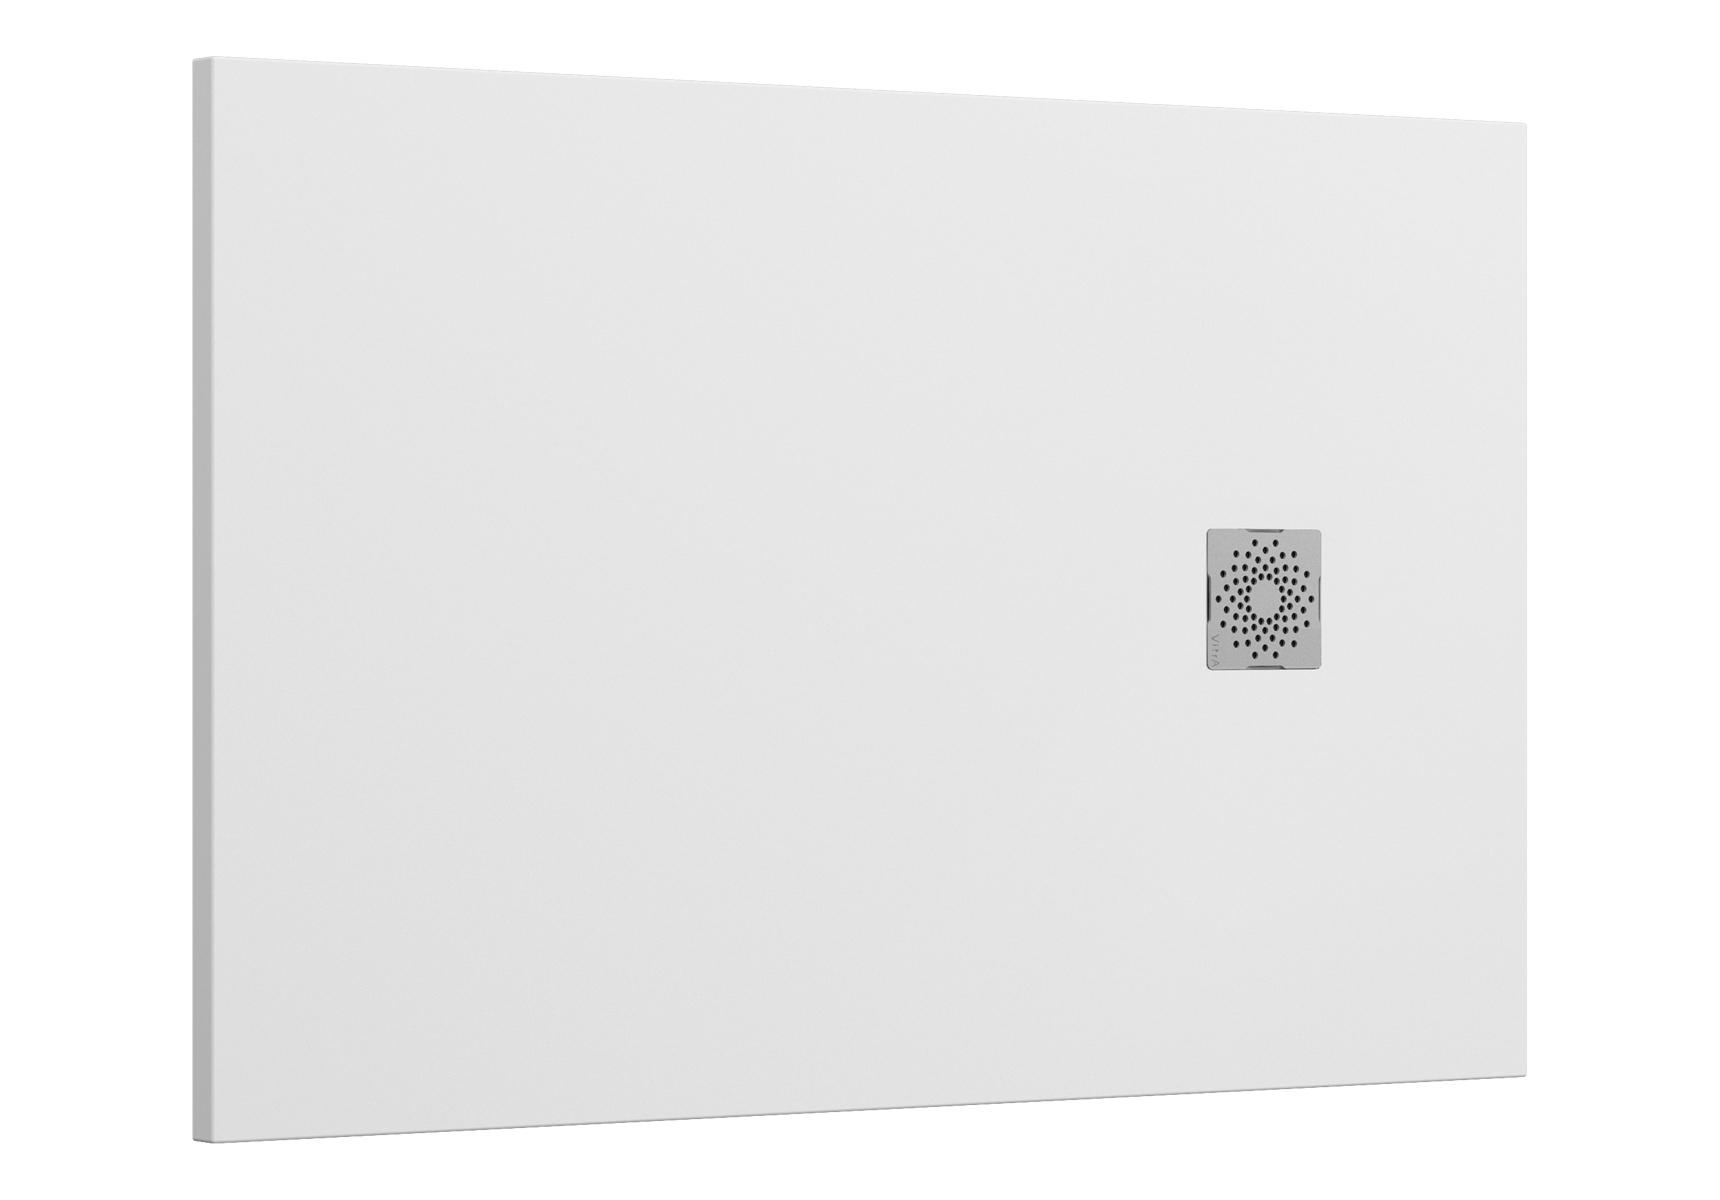 V-Stone Duschwanne, 140 x 90 cm, Weiß